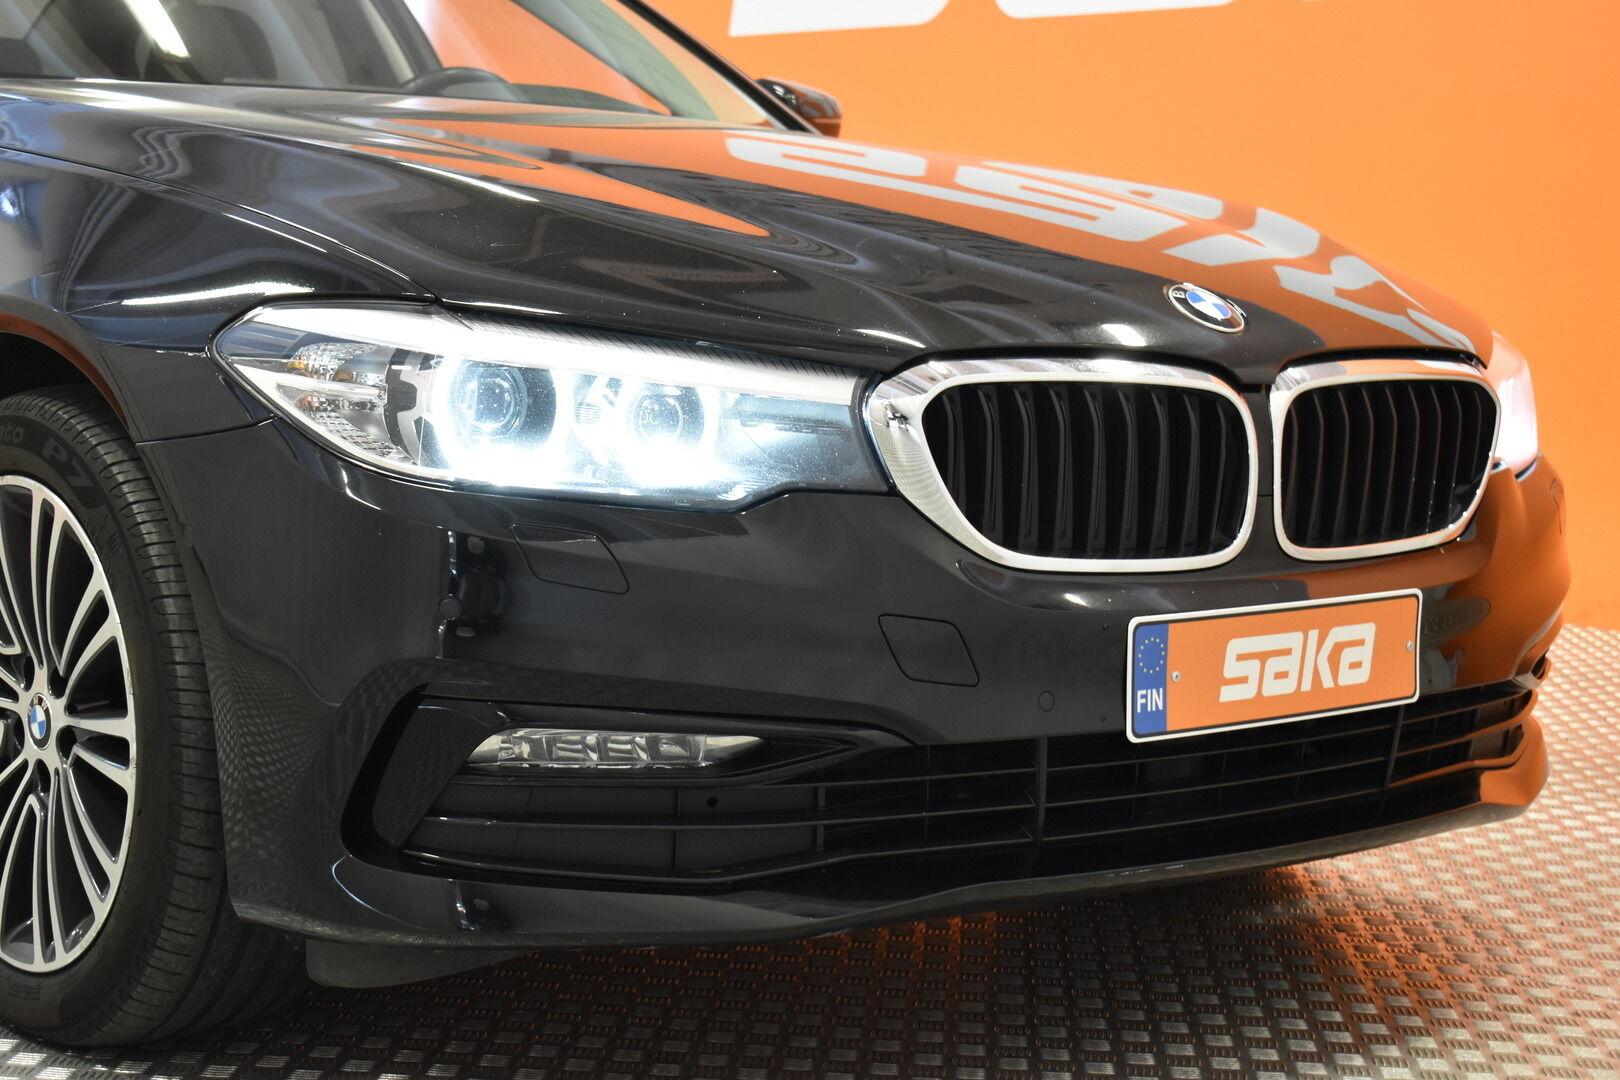 Musta Sedan, BMW 520 – EXP-5828, kuva 9